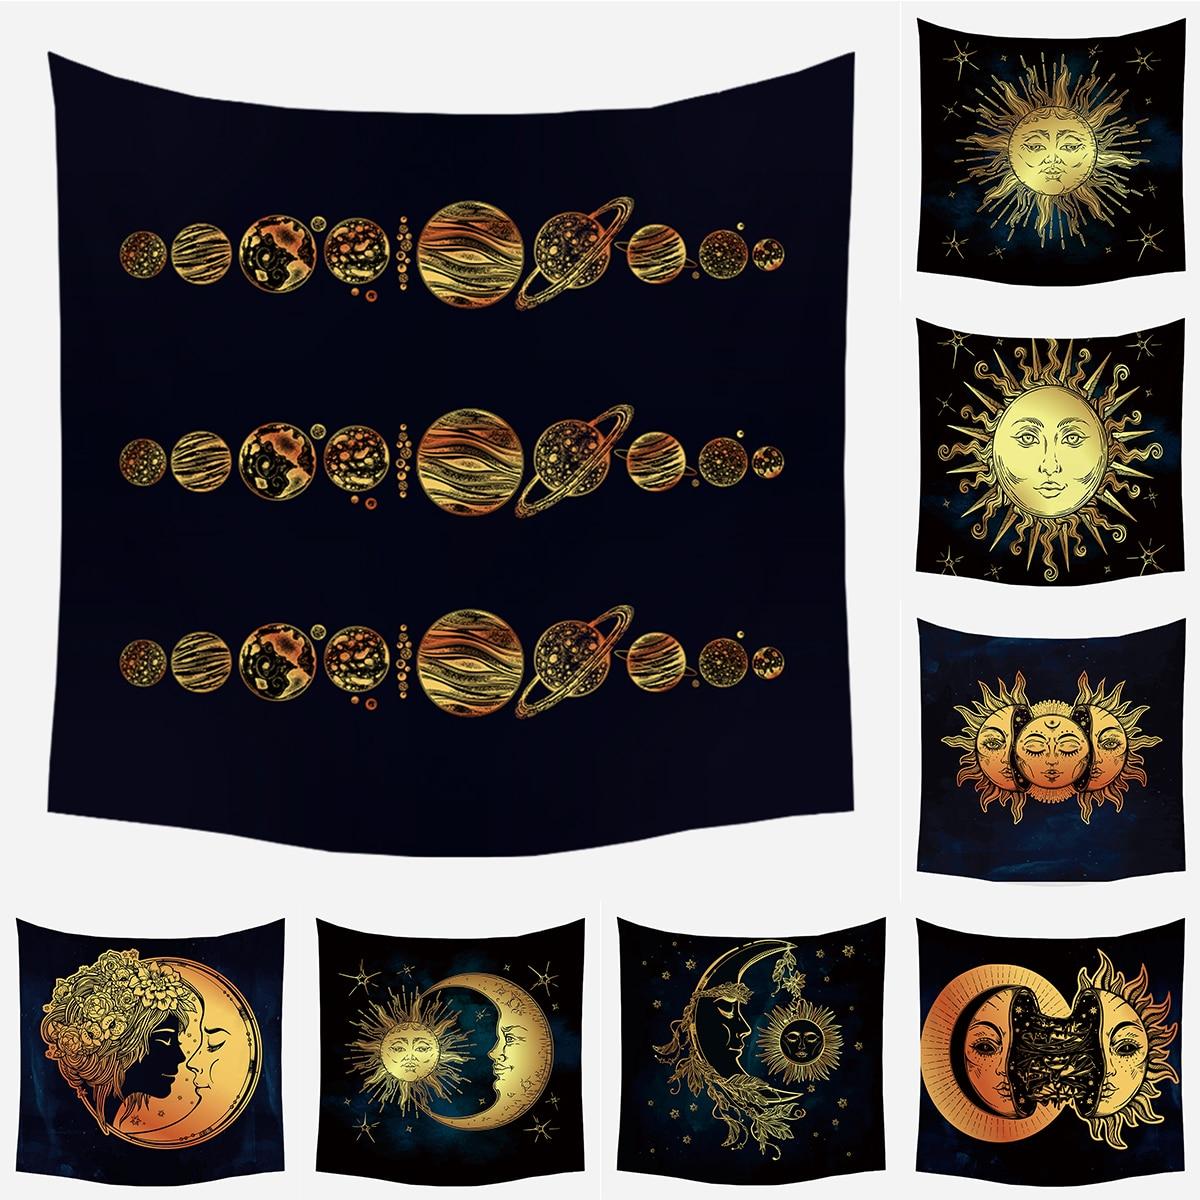 LuanQI Mandala Tapestry Black Sun And Night Moon Tapestry Wall Hanging Gossip Tapestries Hippie Wall Rugs Dorm Decor Blanket 1ps bohemia mandala blankets tapestry elephant wall hanging wandbehang gobelin blanket dorm home decor mantas mandalas